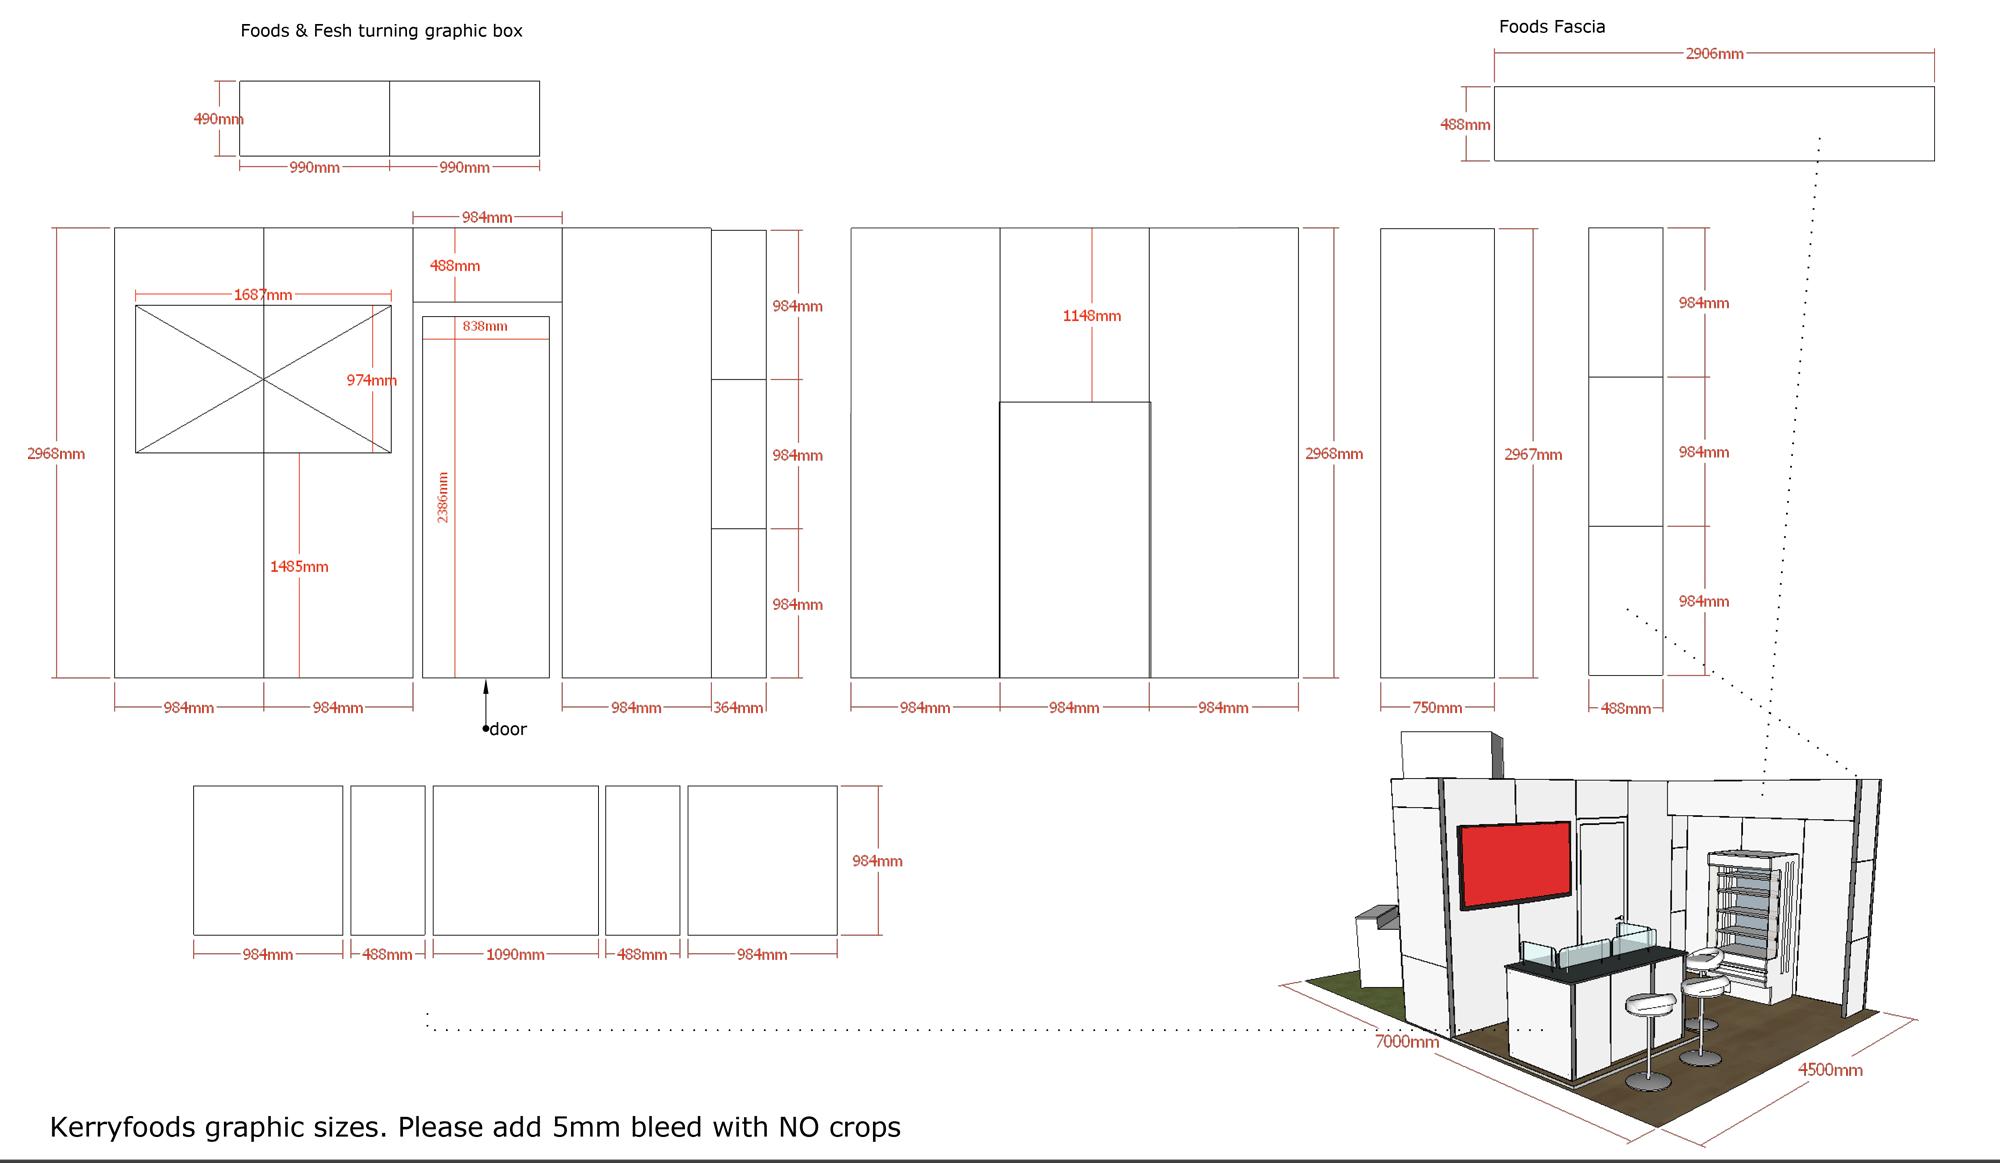 Kerry-Pro-Retail-2015v4-5